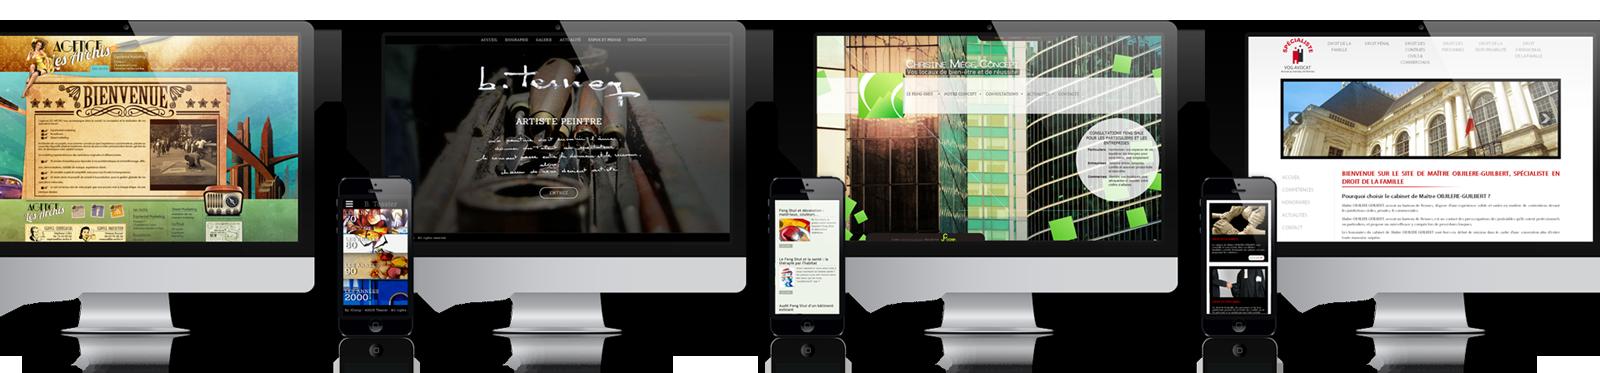 Webdesign et responsive design 01